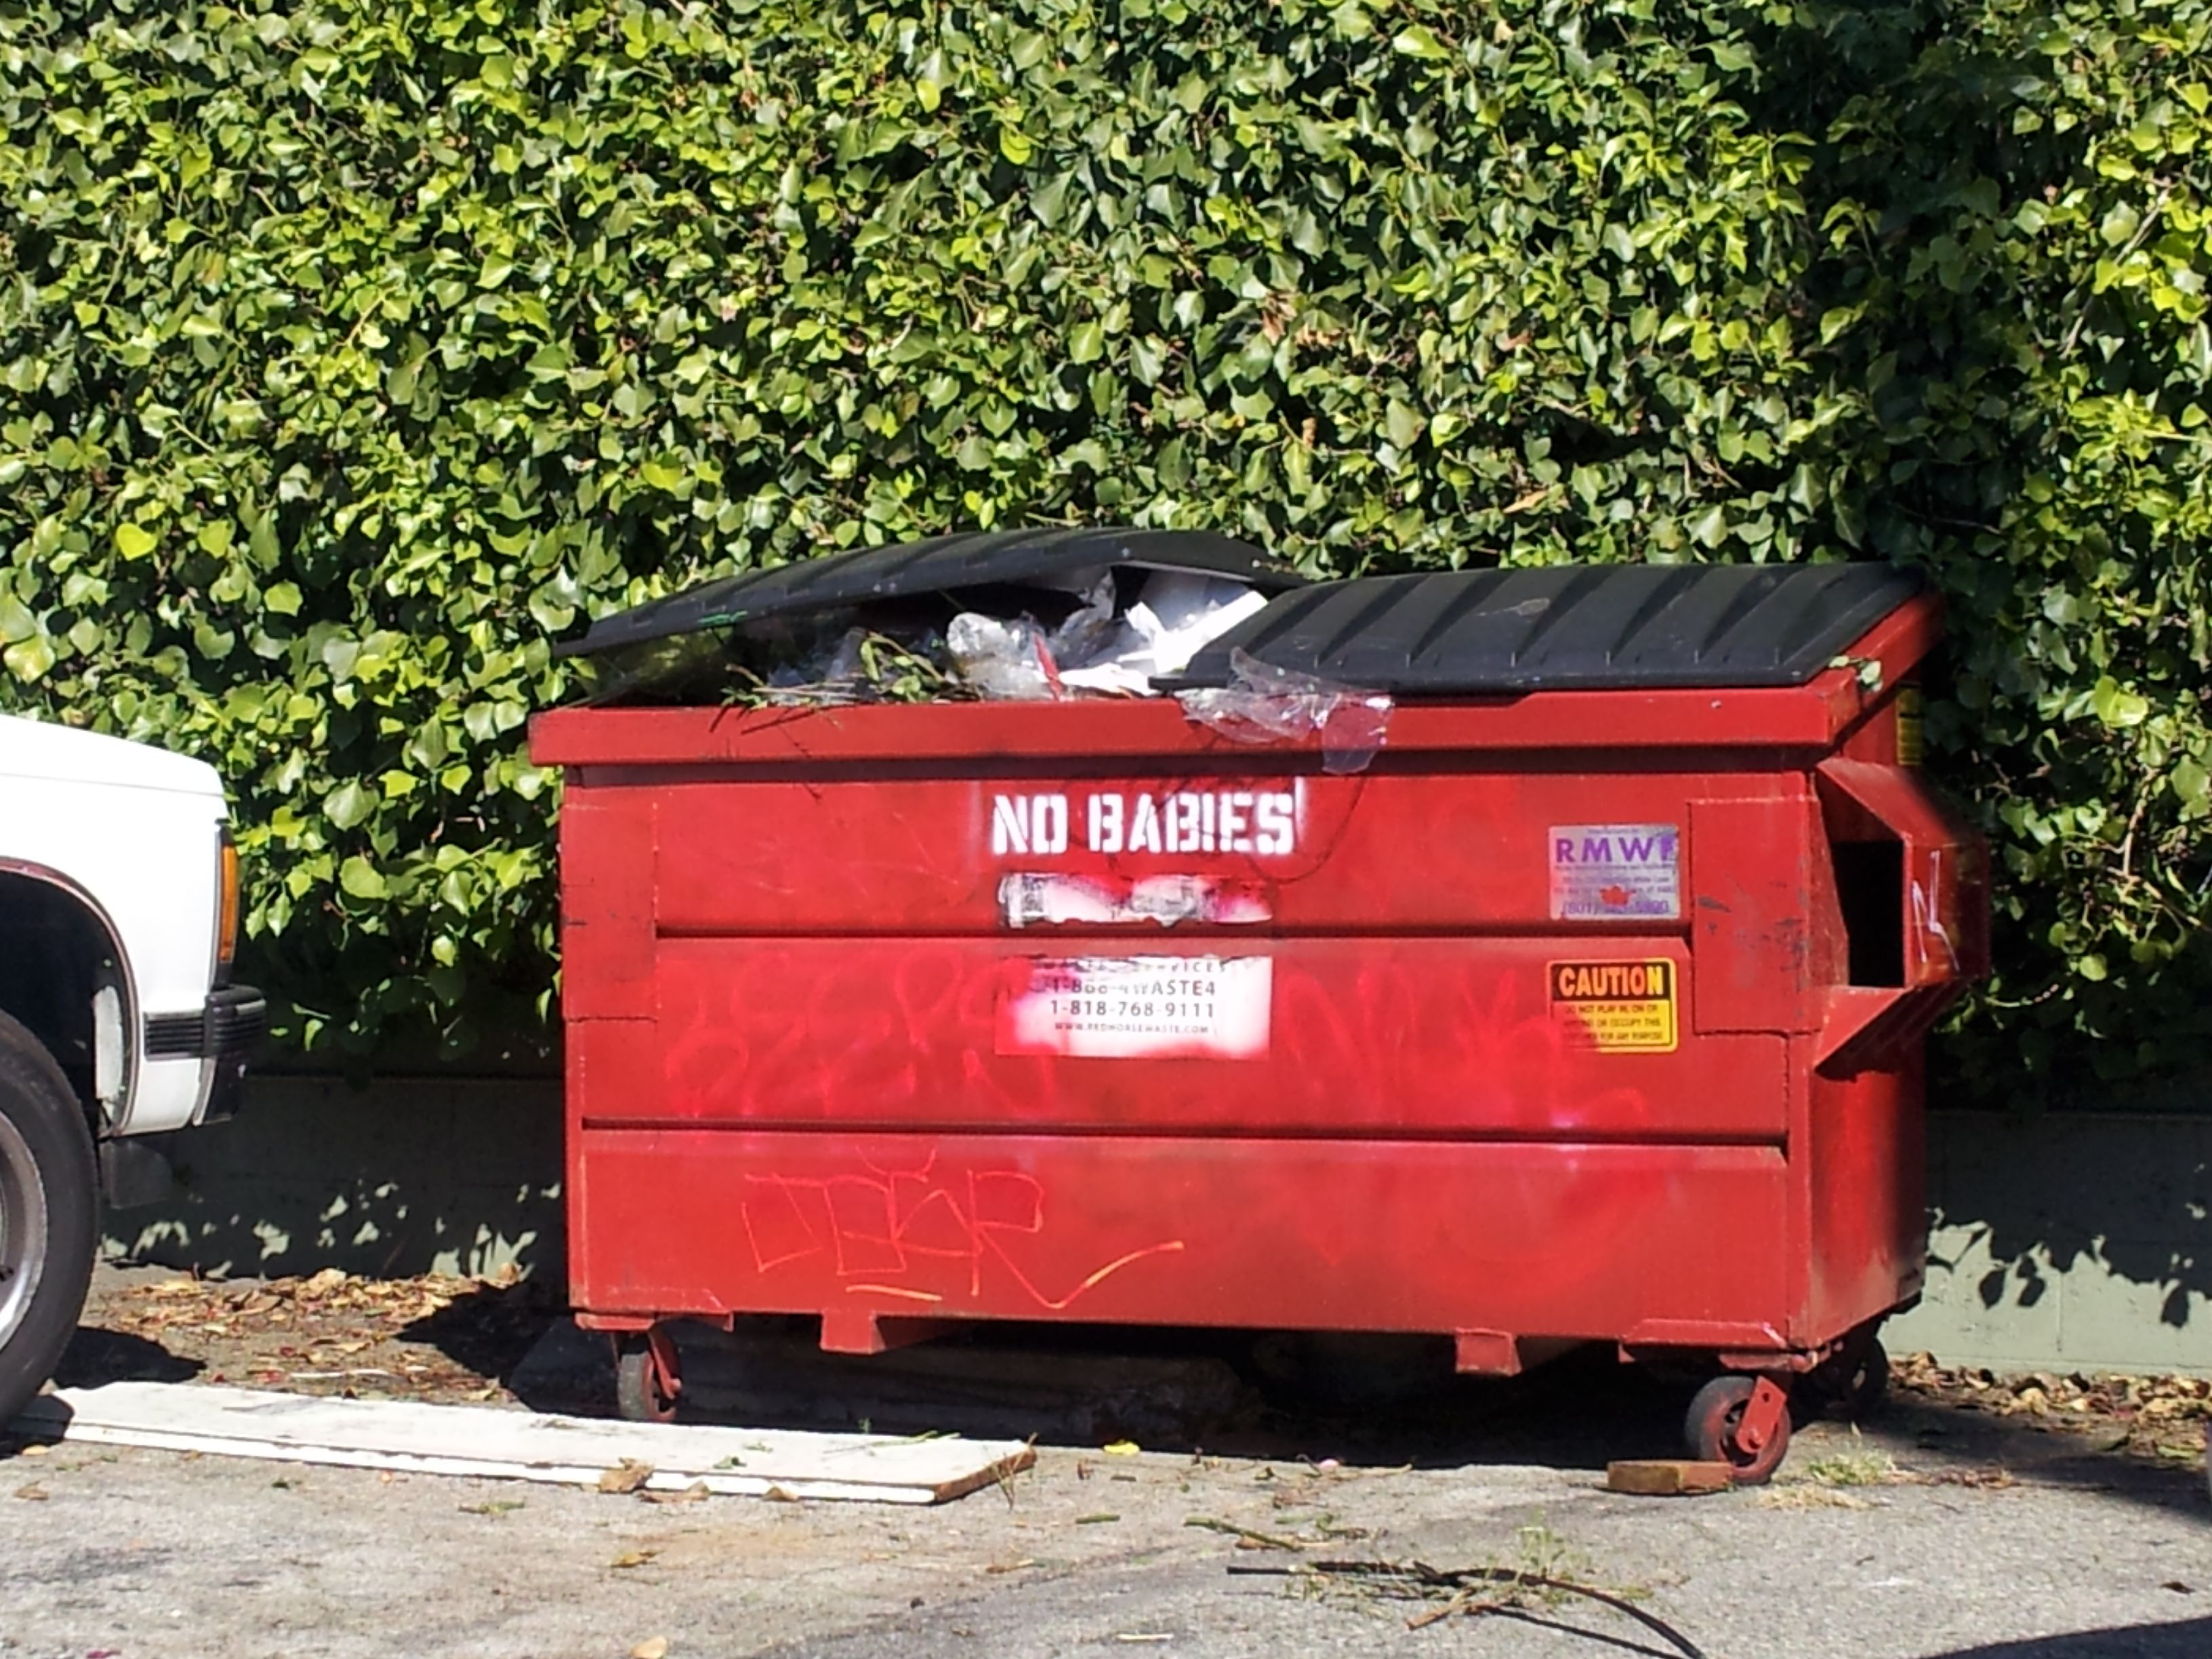 A Garbage Dumpster In Los Angeles Ca Garbage Dumpster Street Art Dumpster